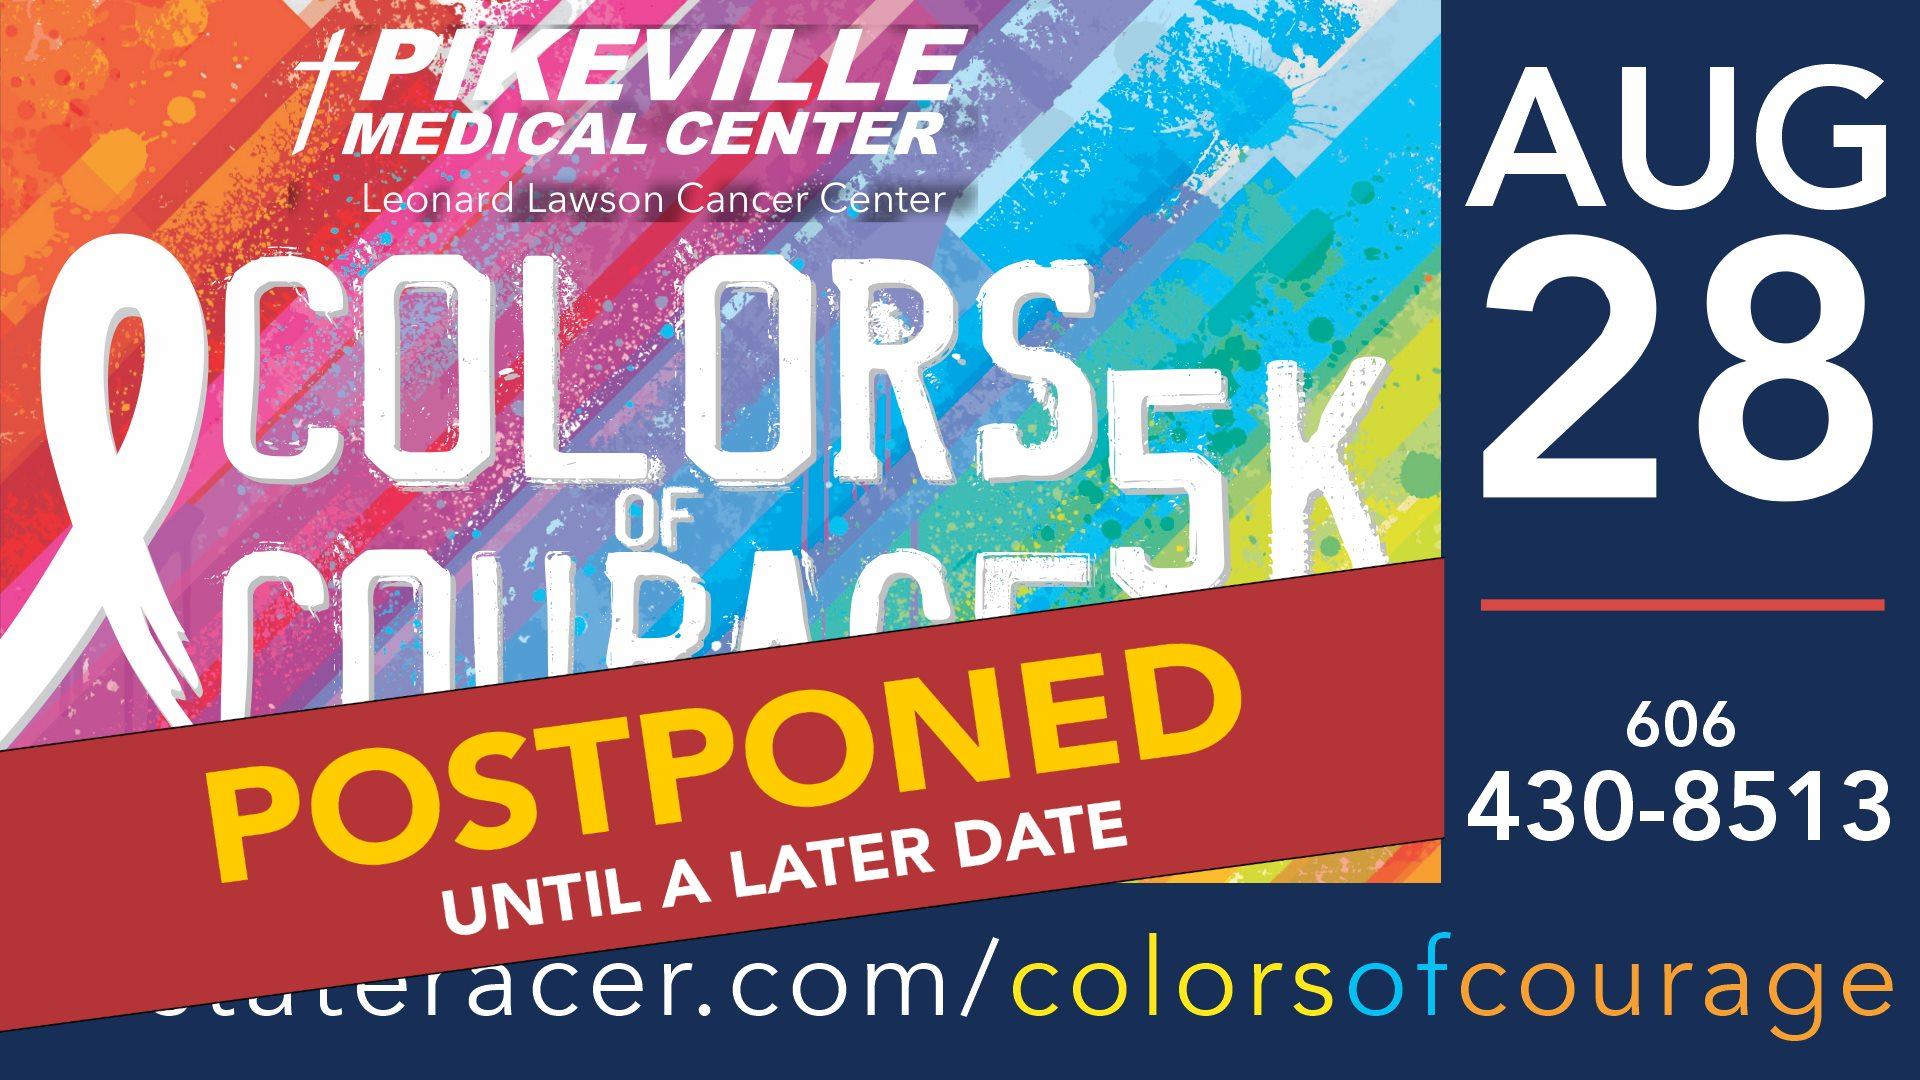 UPDATE: Colors of Courage 5K Postponed